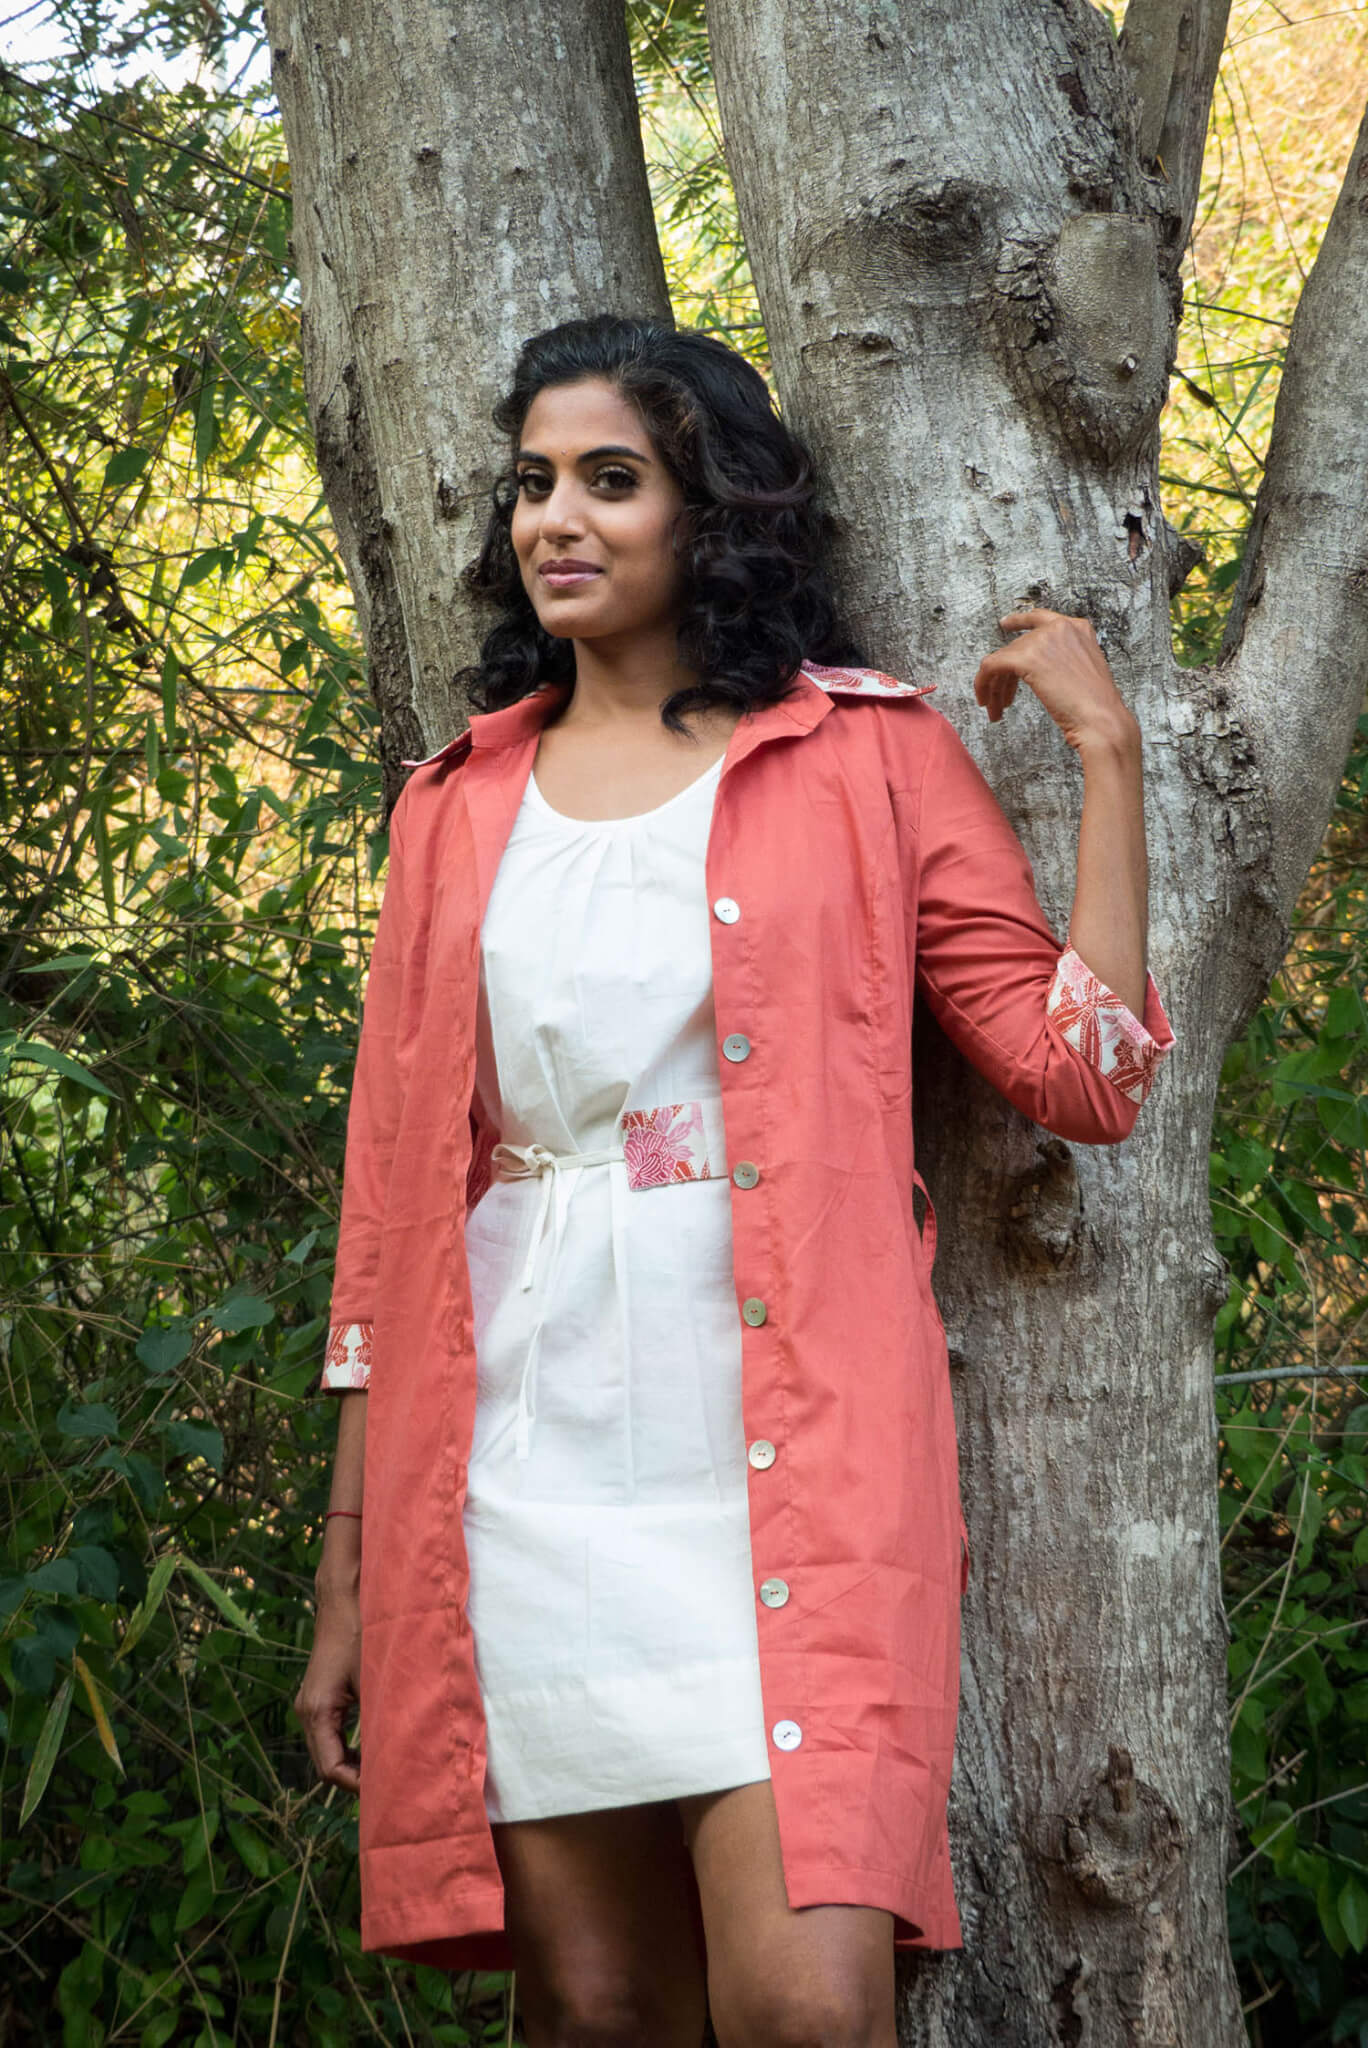 Robe tunique blanche et imprimé rose-orange - Coton bio, tissu de kimono vintage par Takla Makan slow fashion